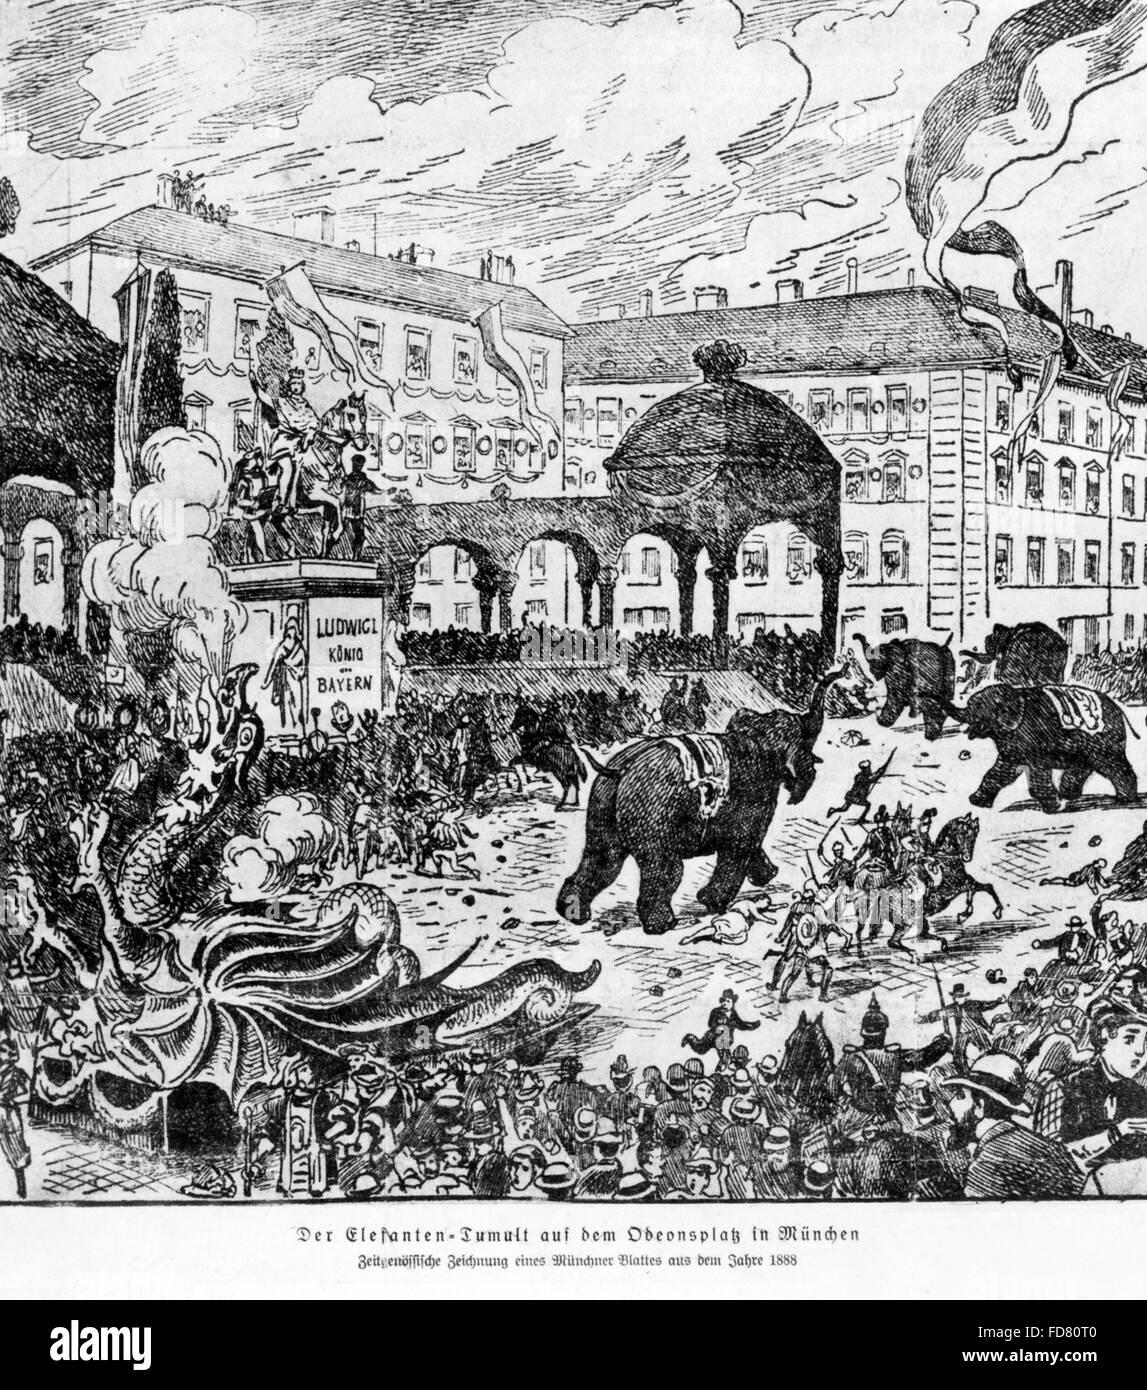 The 'Elefanten-Tumult' on Odeonsplatz in Munich, 1888 - Stock Image